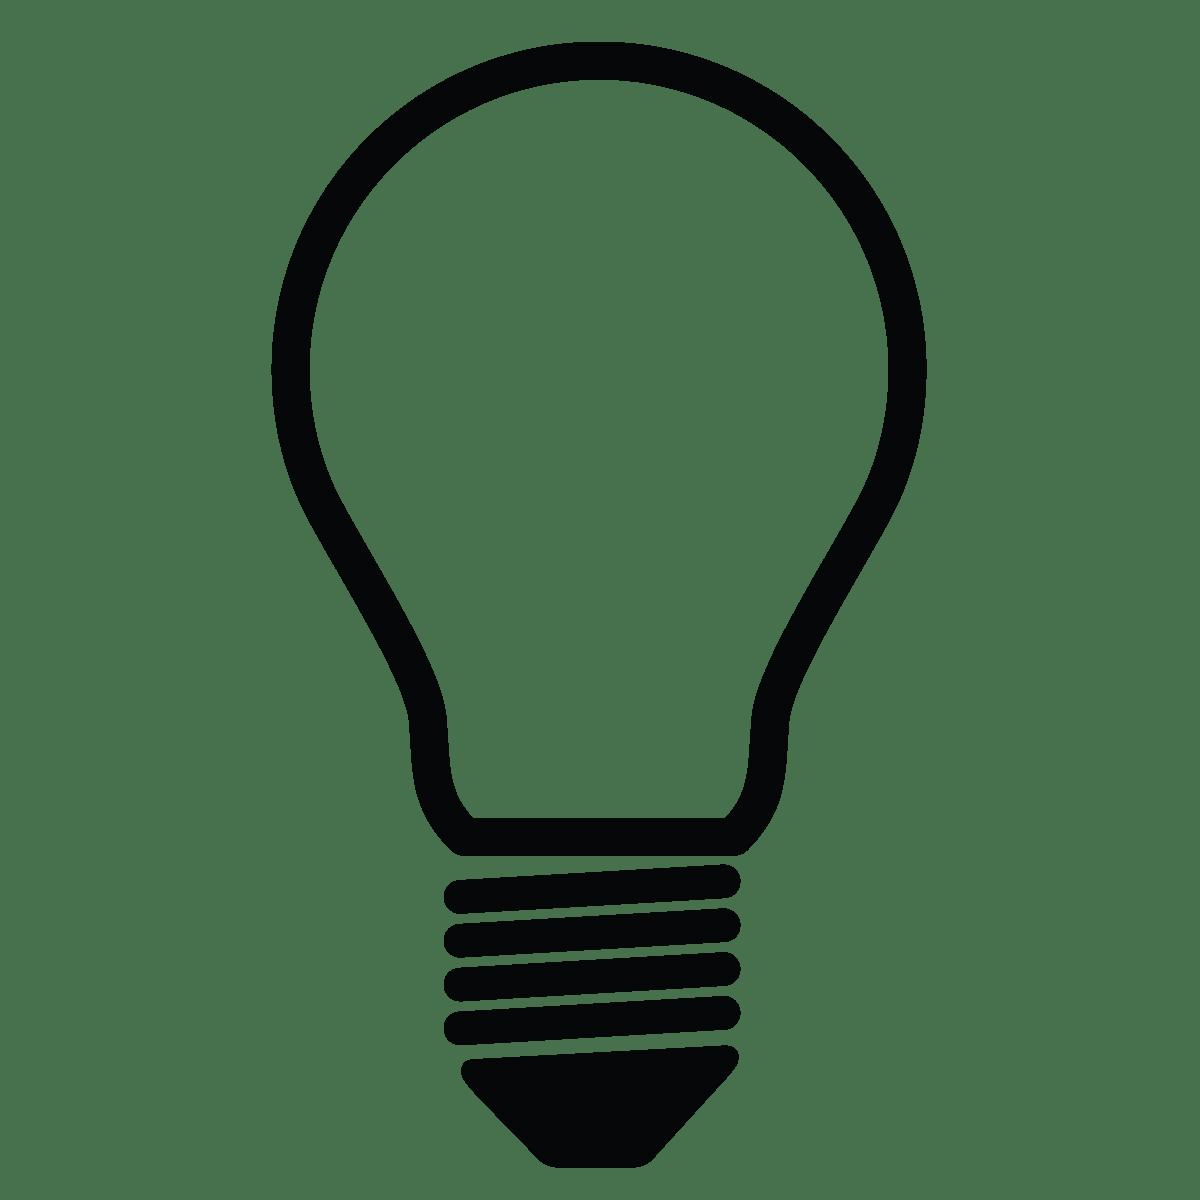 Lamp Clipart Light Globe Lamp Light Globe Transparent